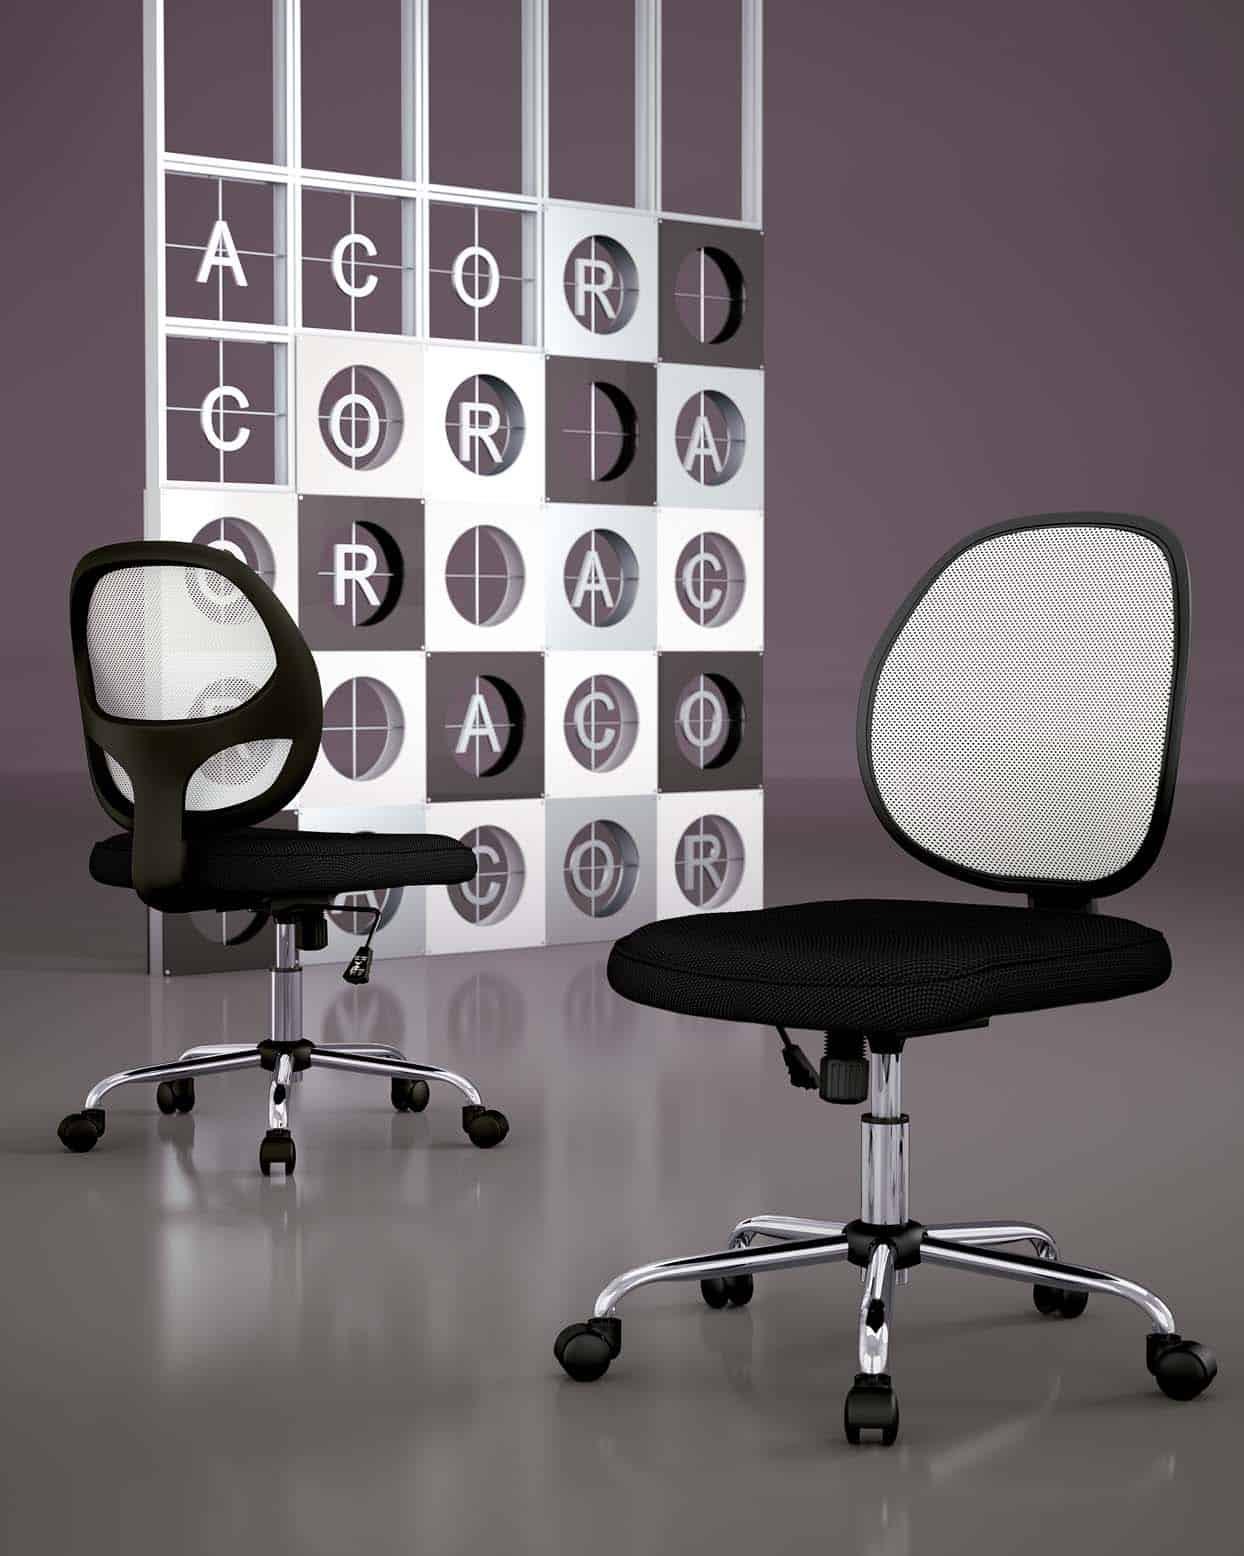 silla Acor